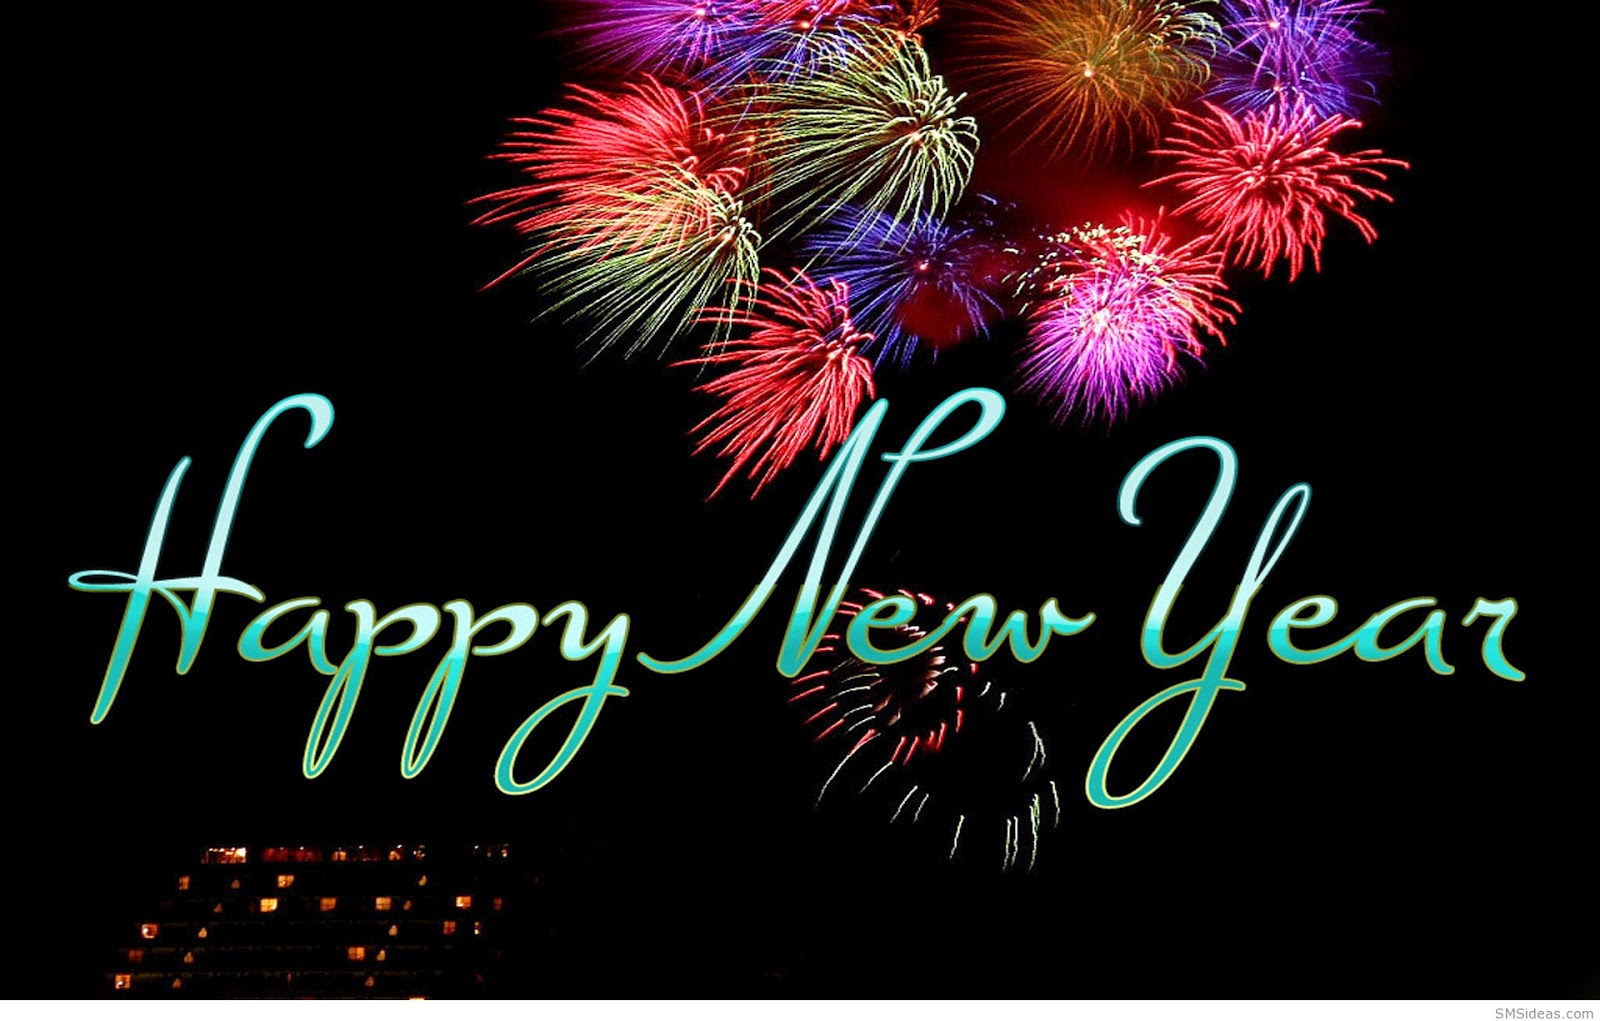 Happy New Year Hd Wallpaper Download Rocks Wallpaper Hd 1600x1021